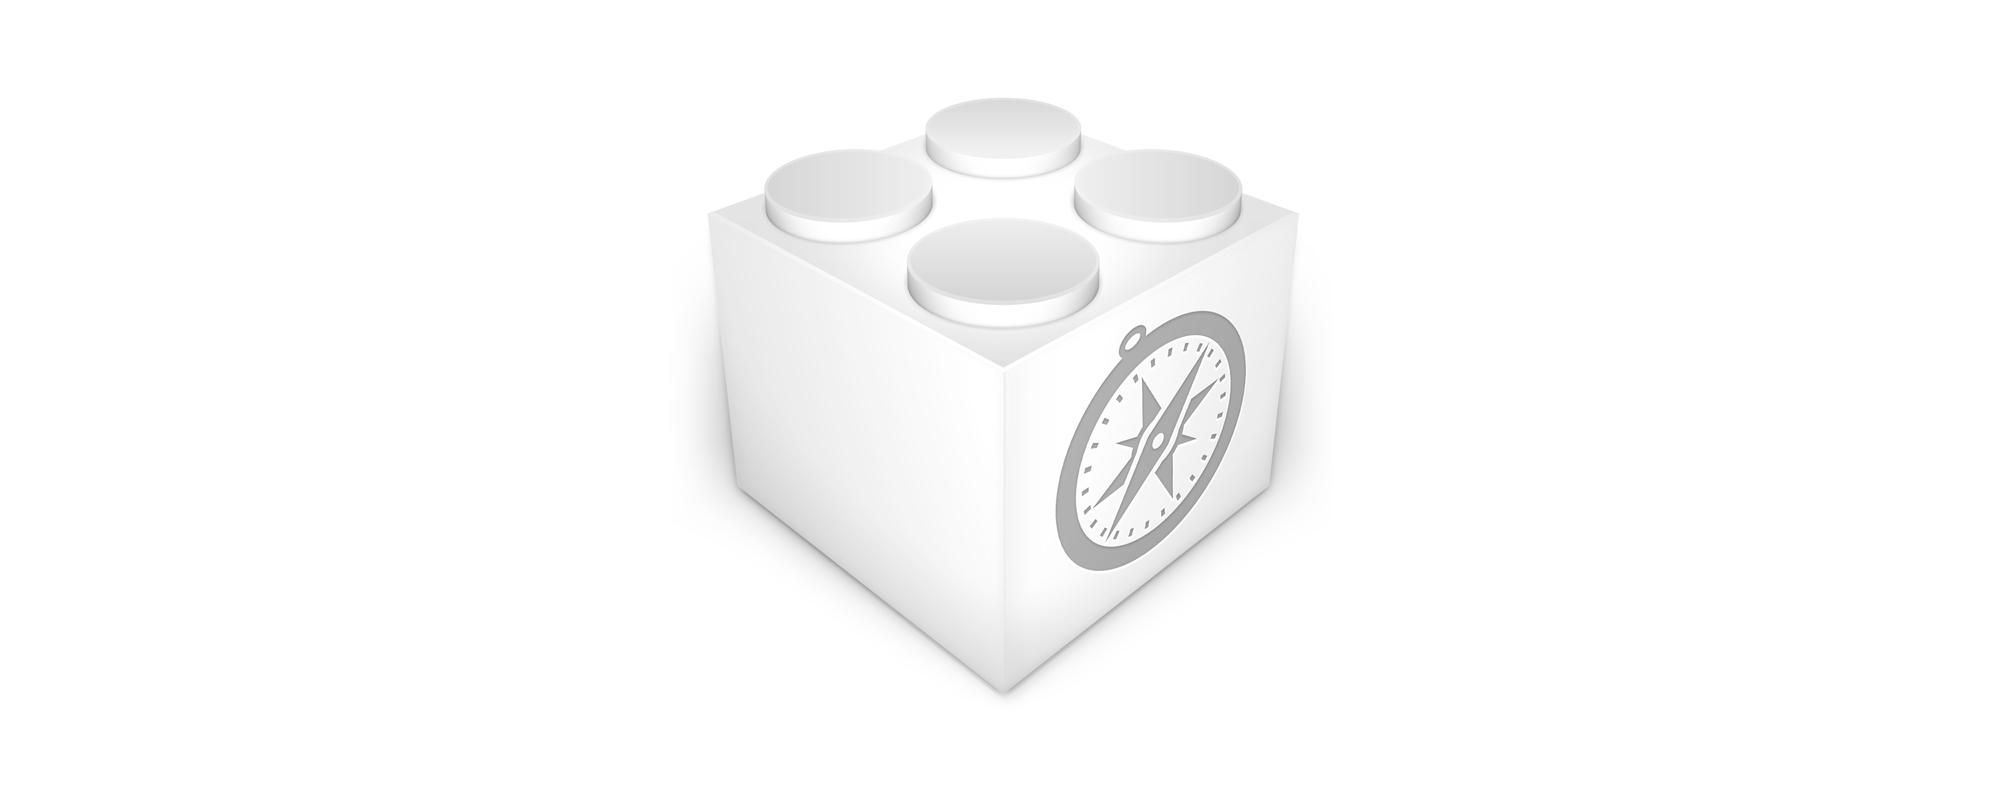 Safari-Extension-Hero-2000px